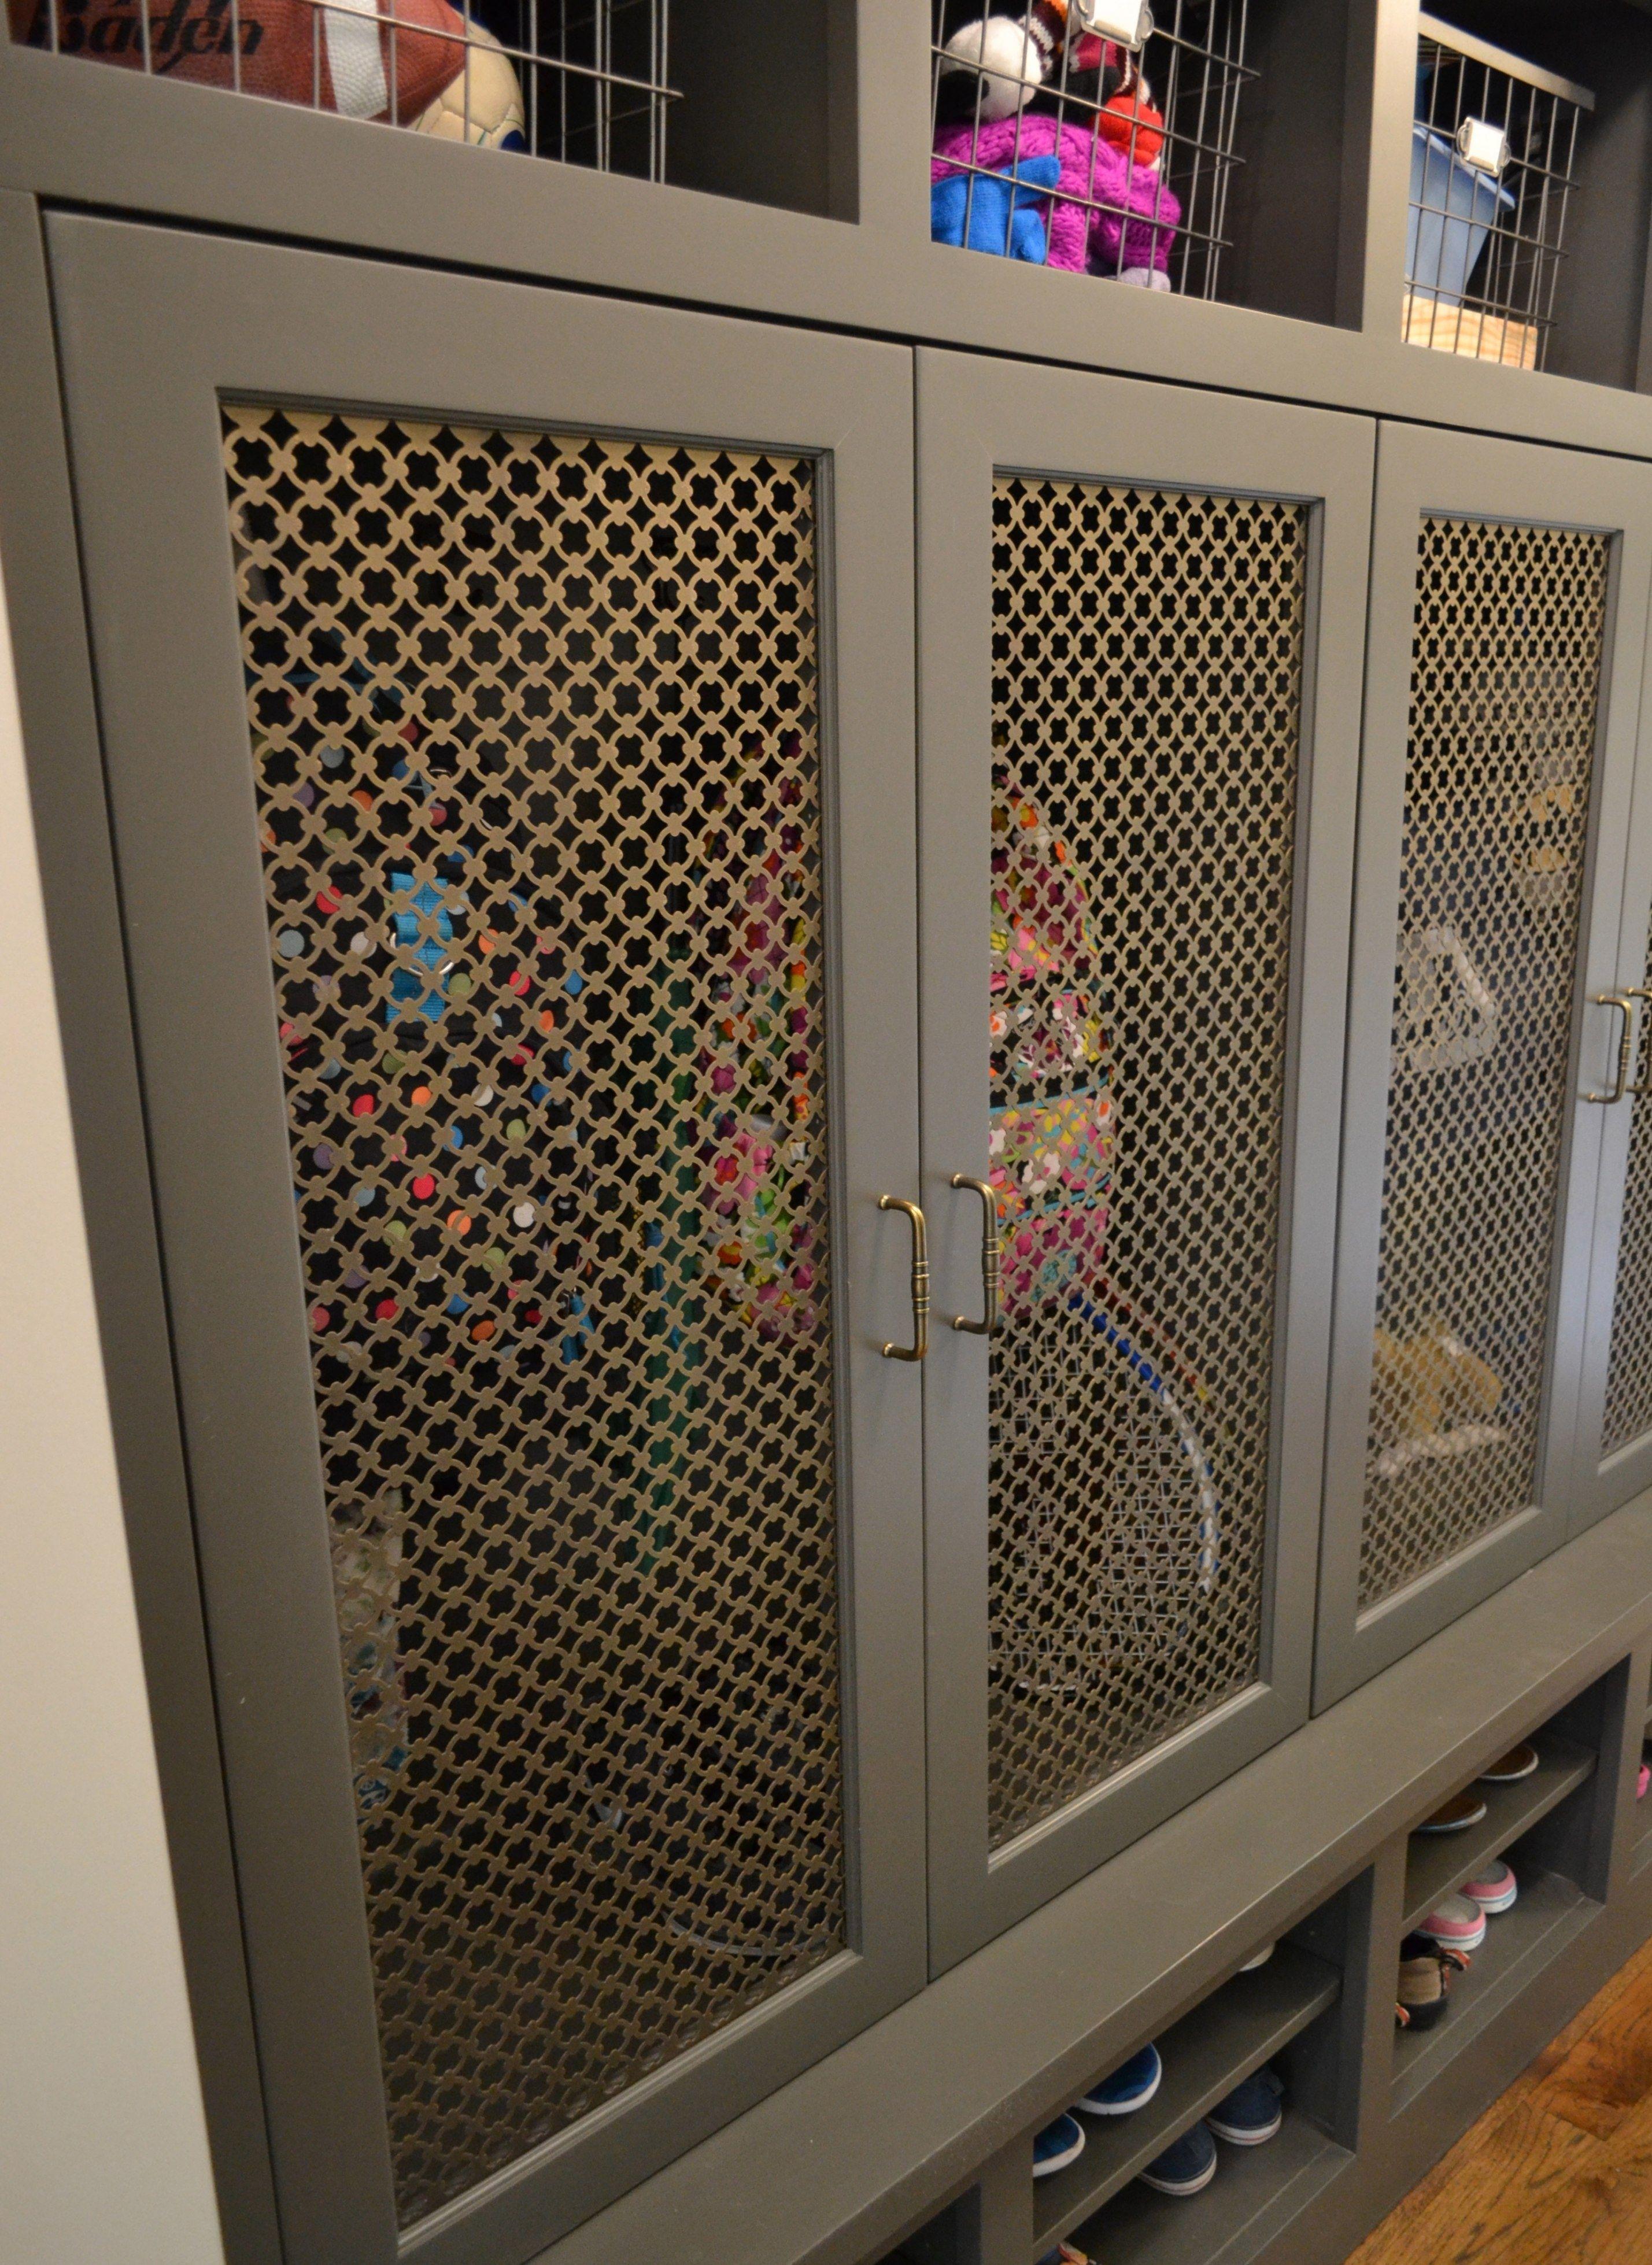 Wire Mesh Cabinet Door Panels - Having a kitchen that ...